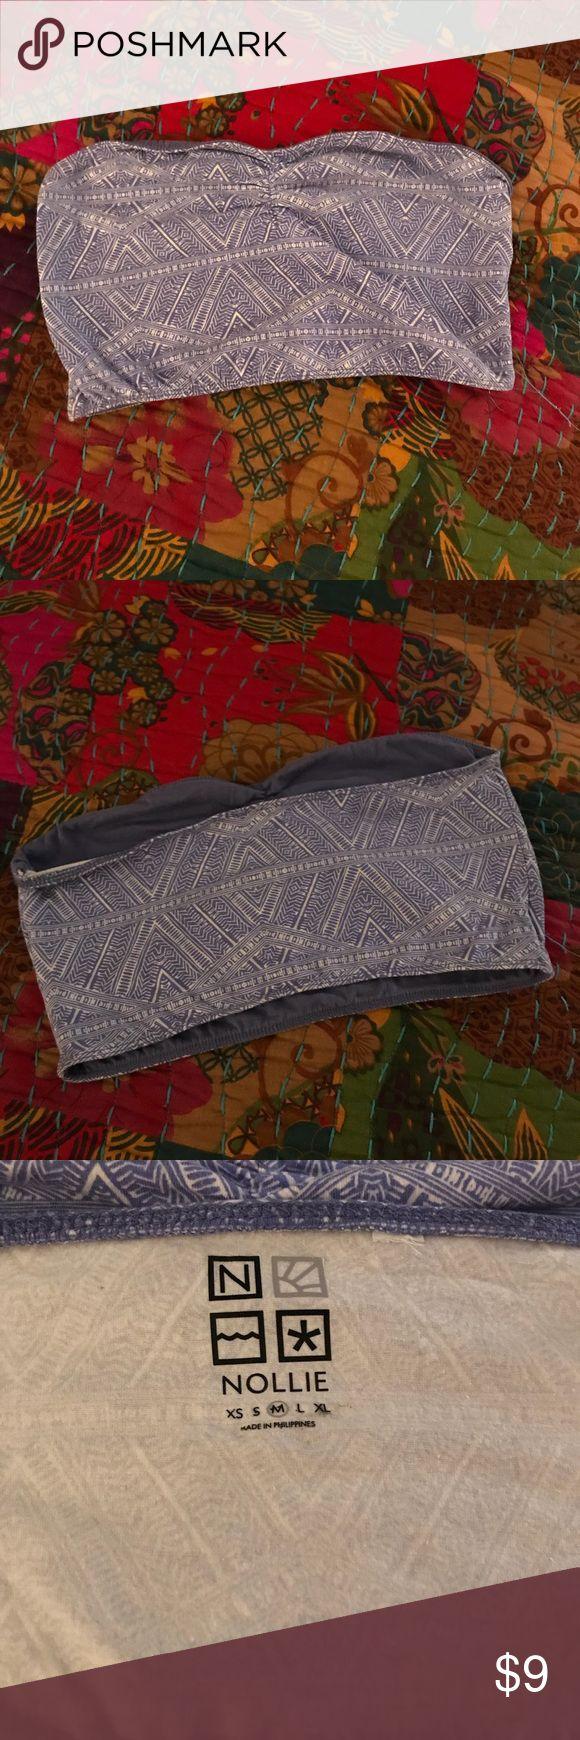 Pacsun bandeau printed bandeau, perfect condition PacSun Intimates & Sleepwear Bandeaus